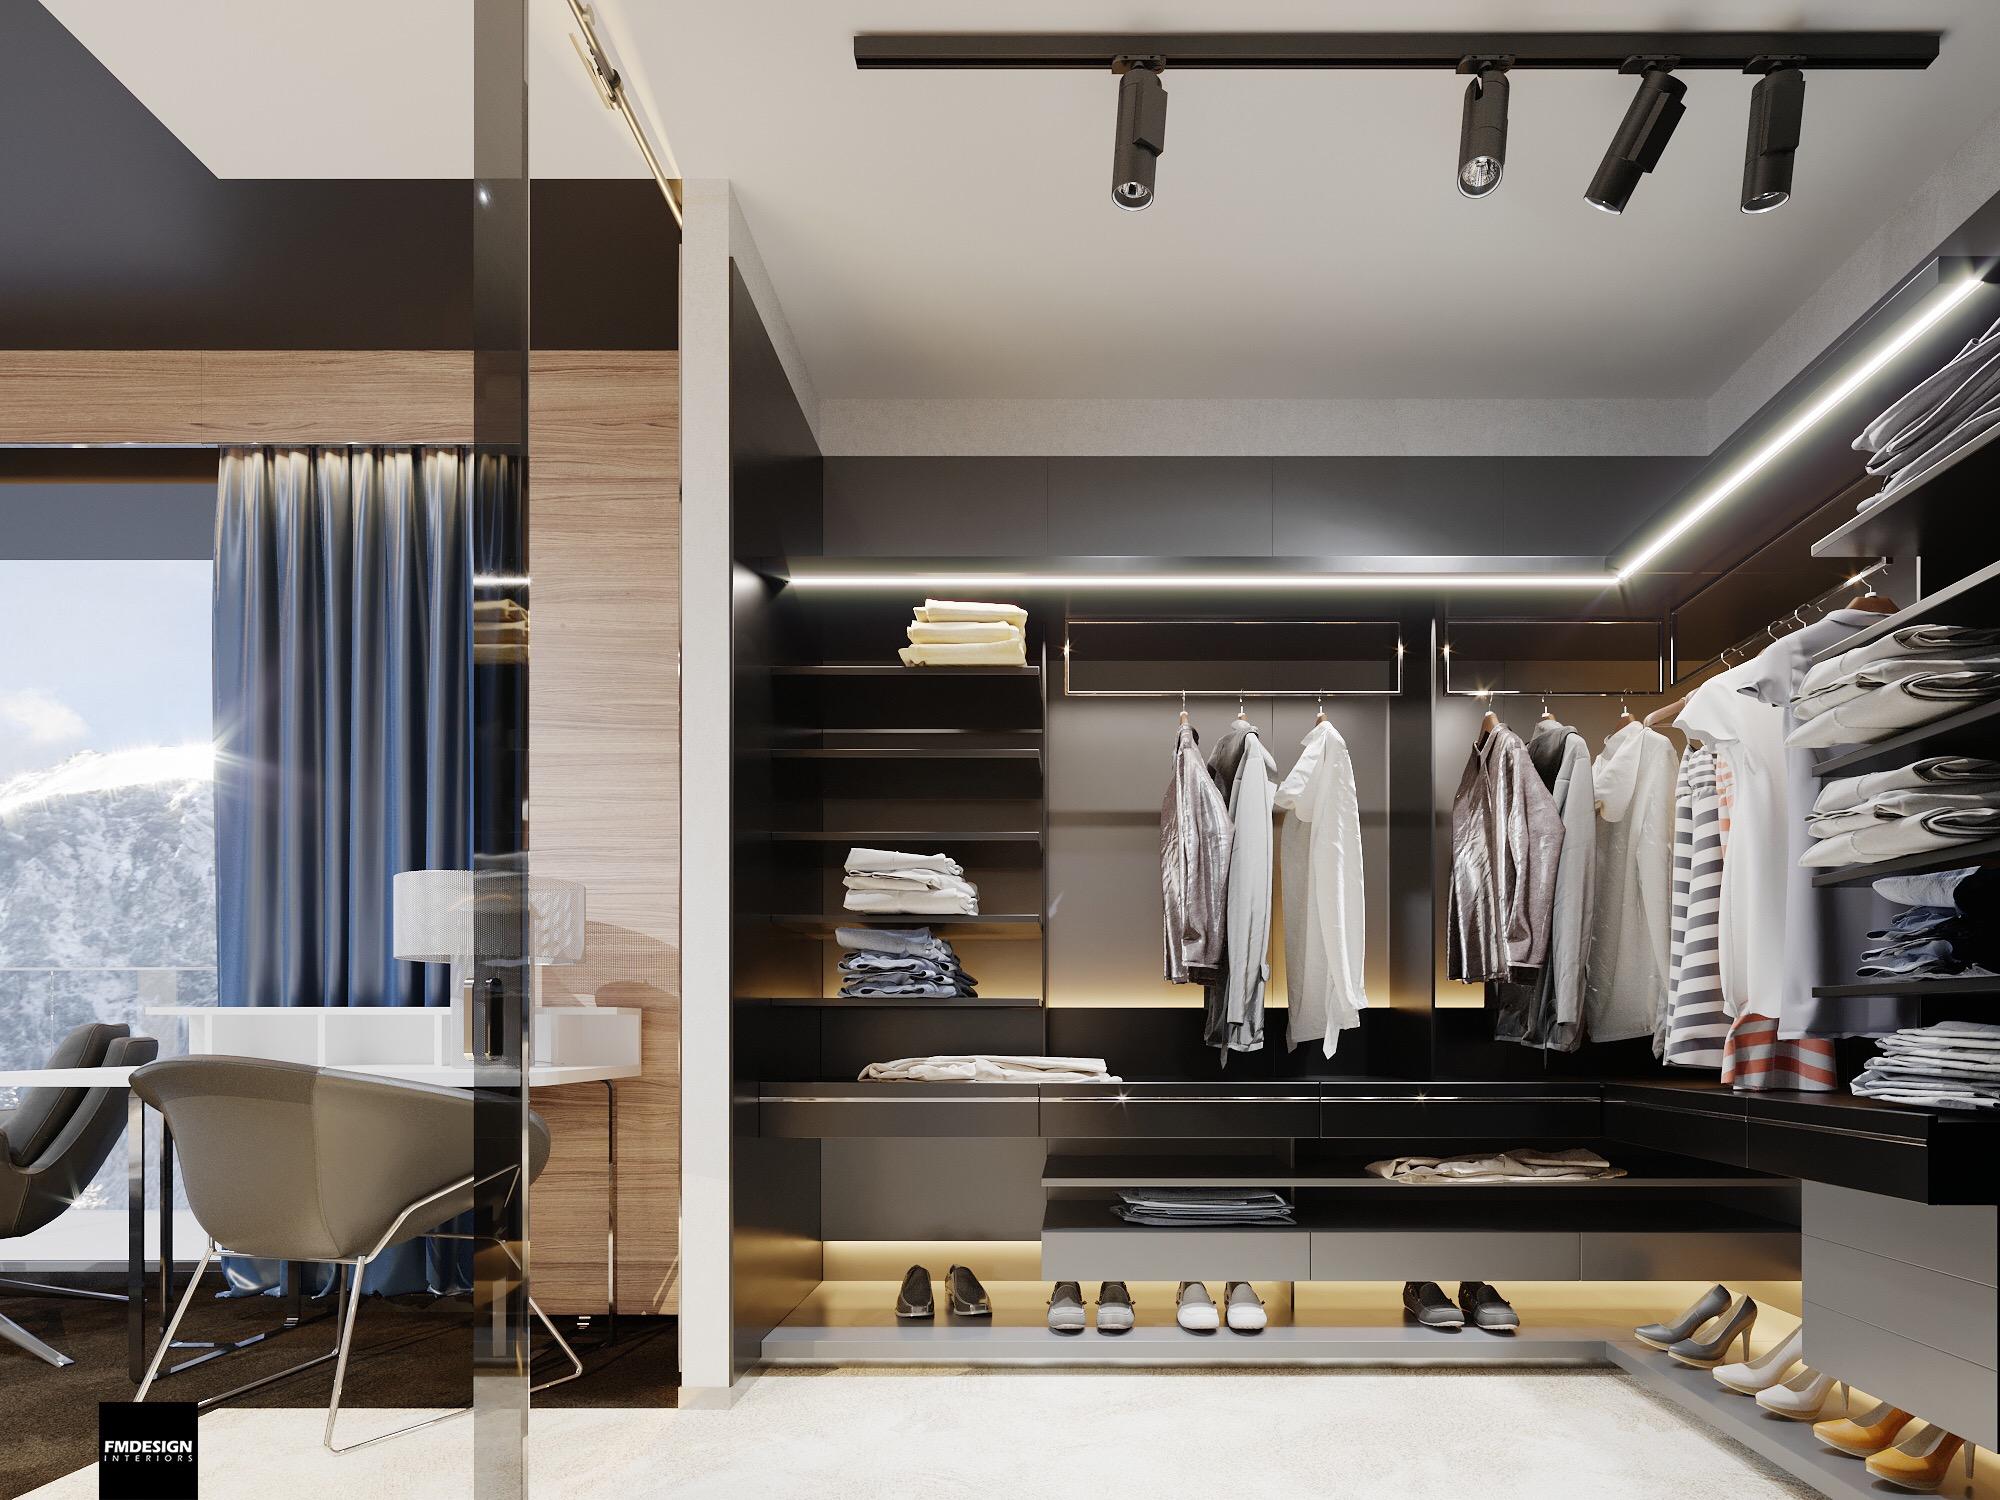 dizajn apartmanu hotelovy nabytok (12)